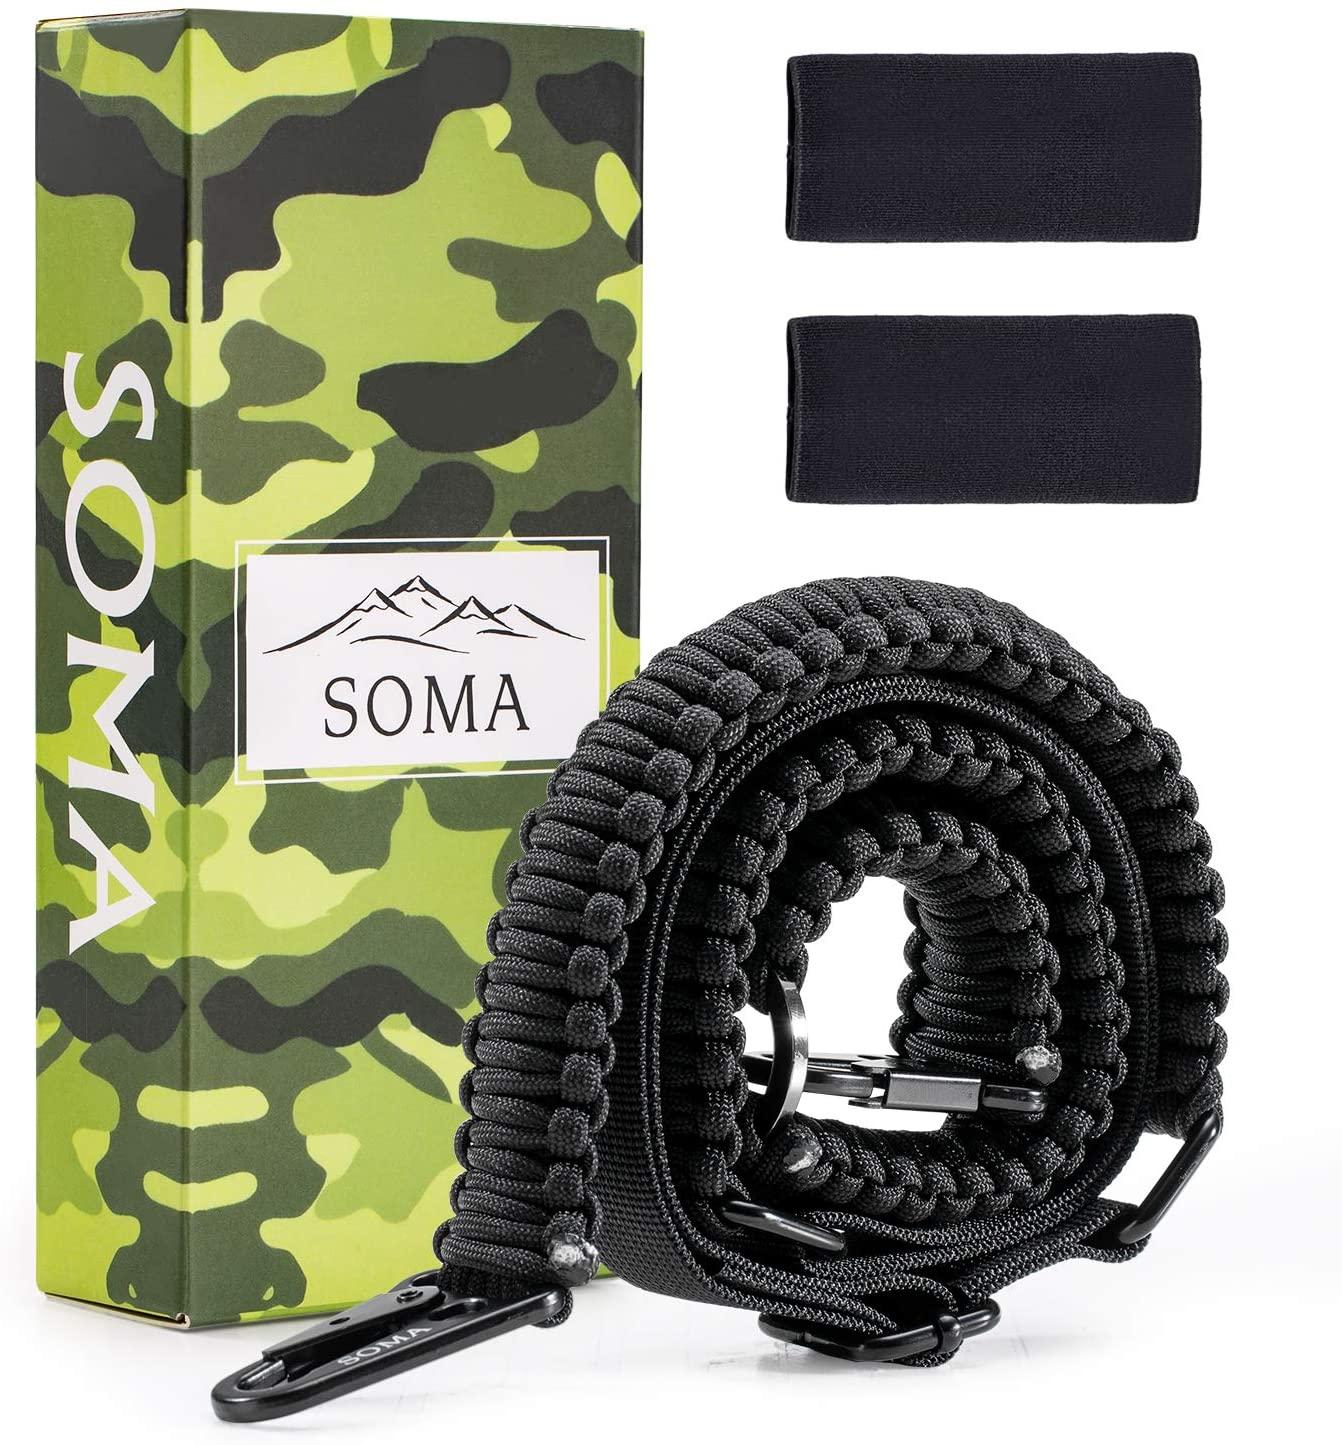 SOMA Rifle Sling 550 Paracord Gun Sling 2 Point Shotgun Strap Adjustable Belt with Eagle Hook for Outdoor Sports Hunting